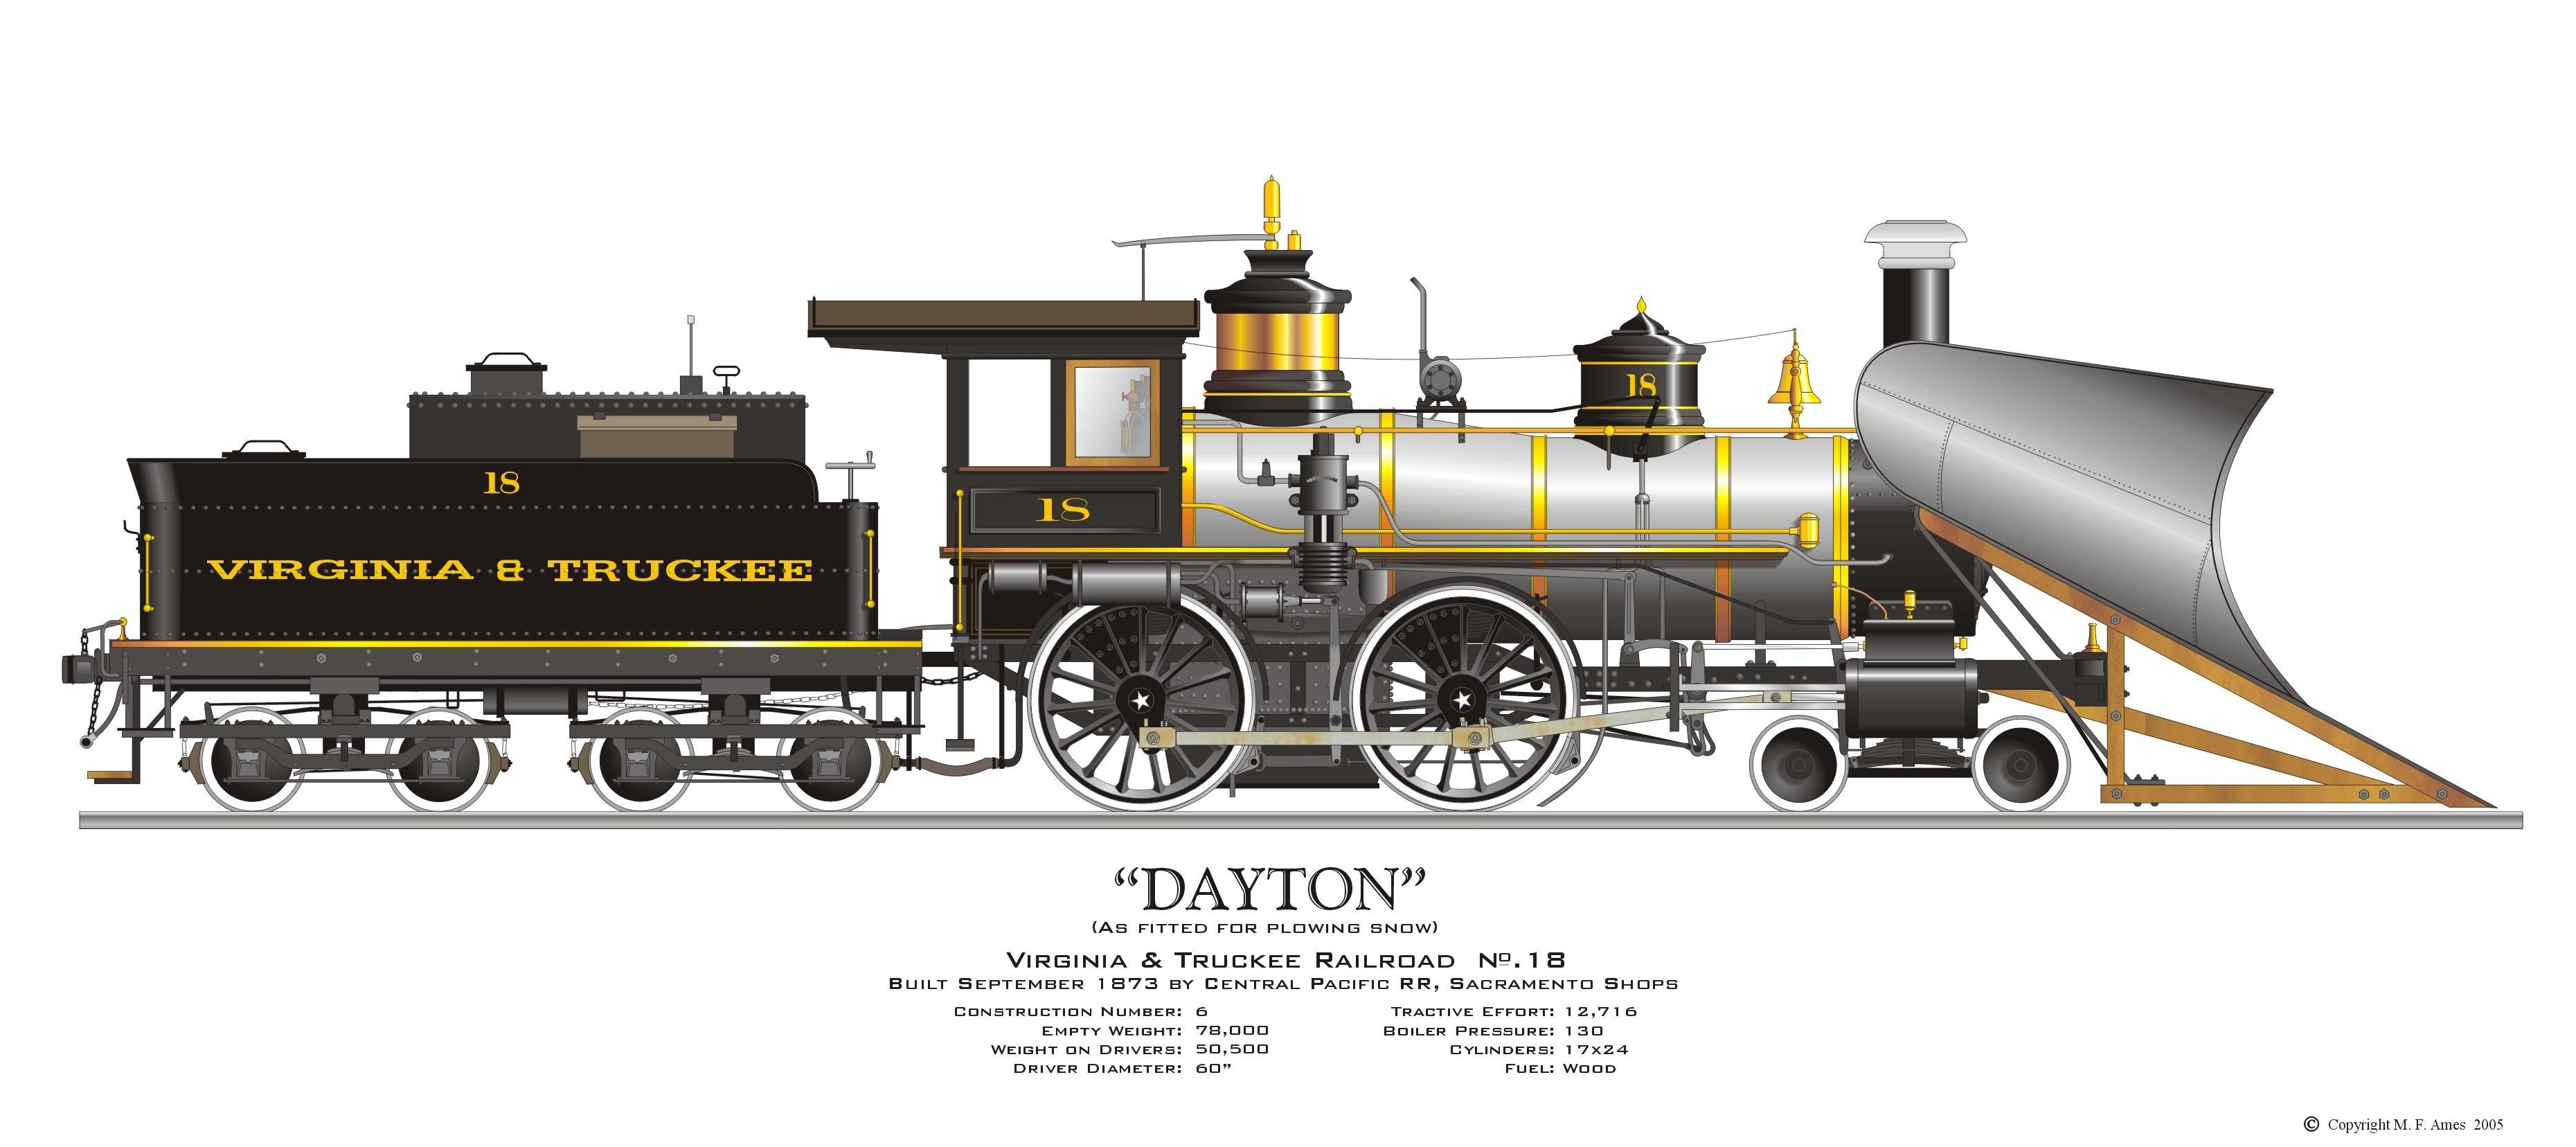 3720x1656 Virginia Amp Truckee, Locomotive